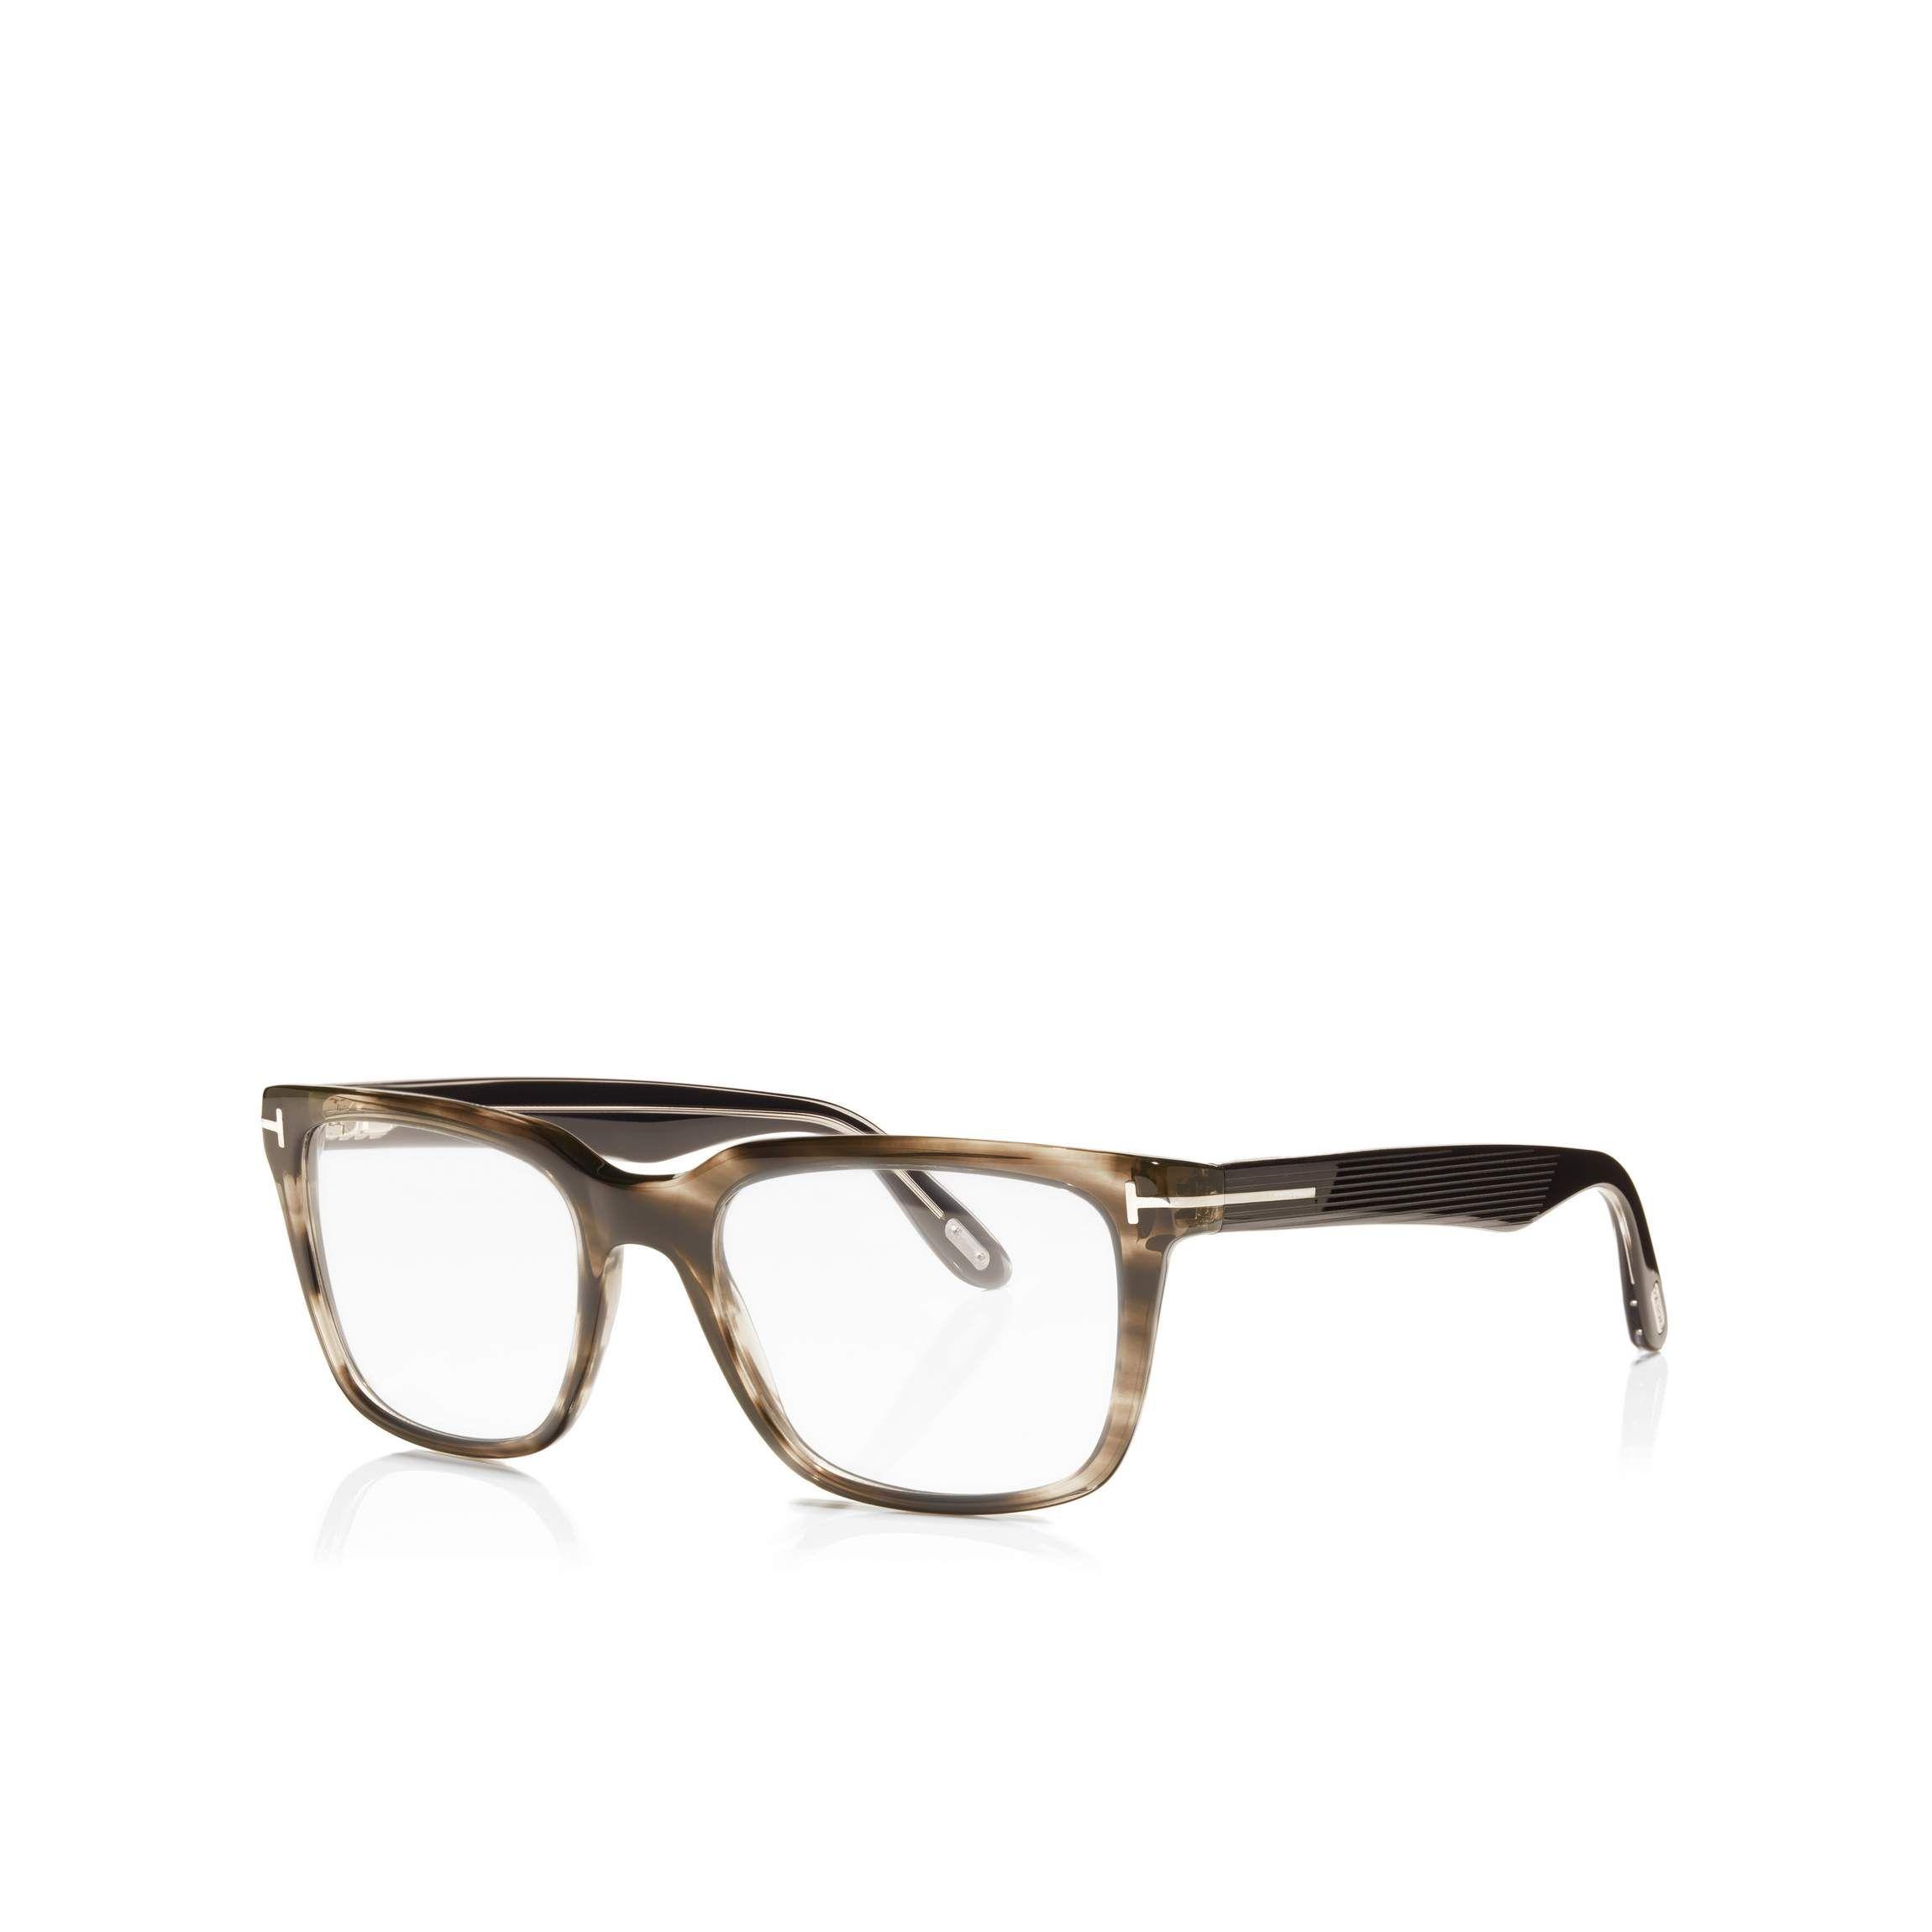 optg tmf eyeglass ford shop eyeglasses product frames blue luxury foxy round foxyluxury tom rakuten